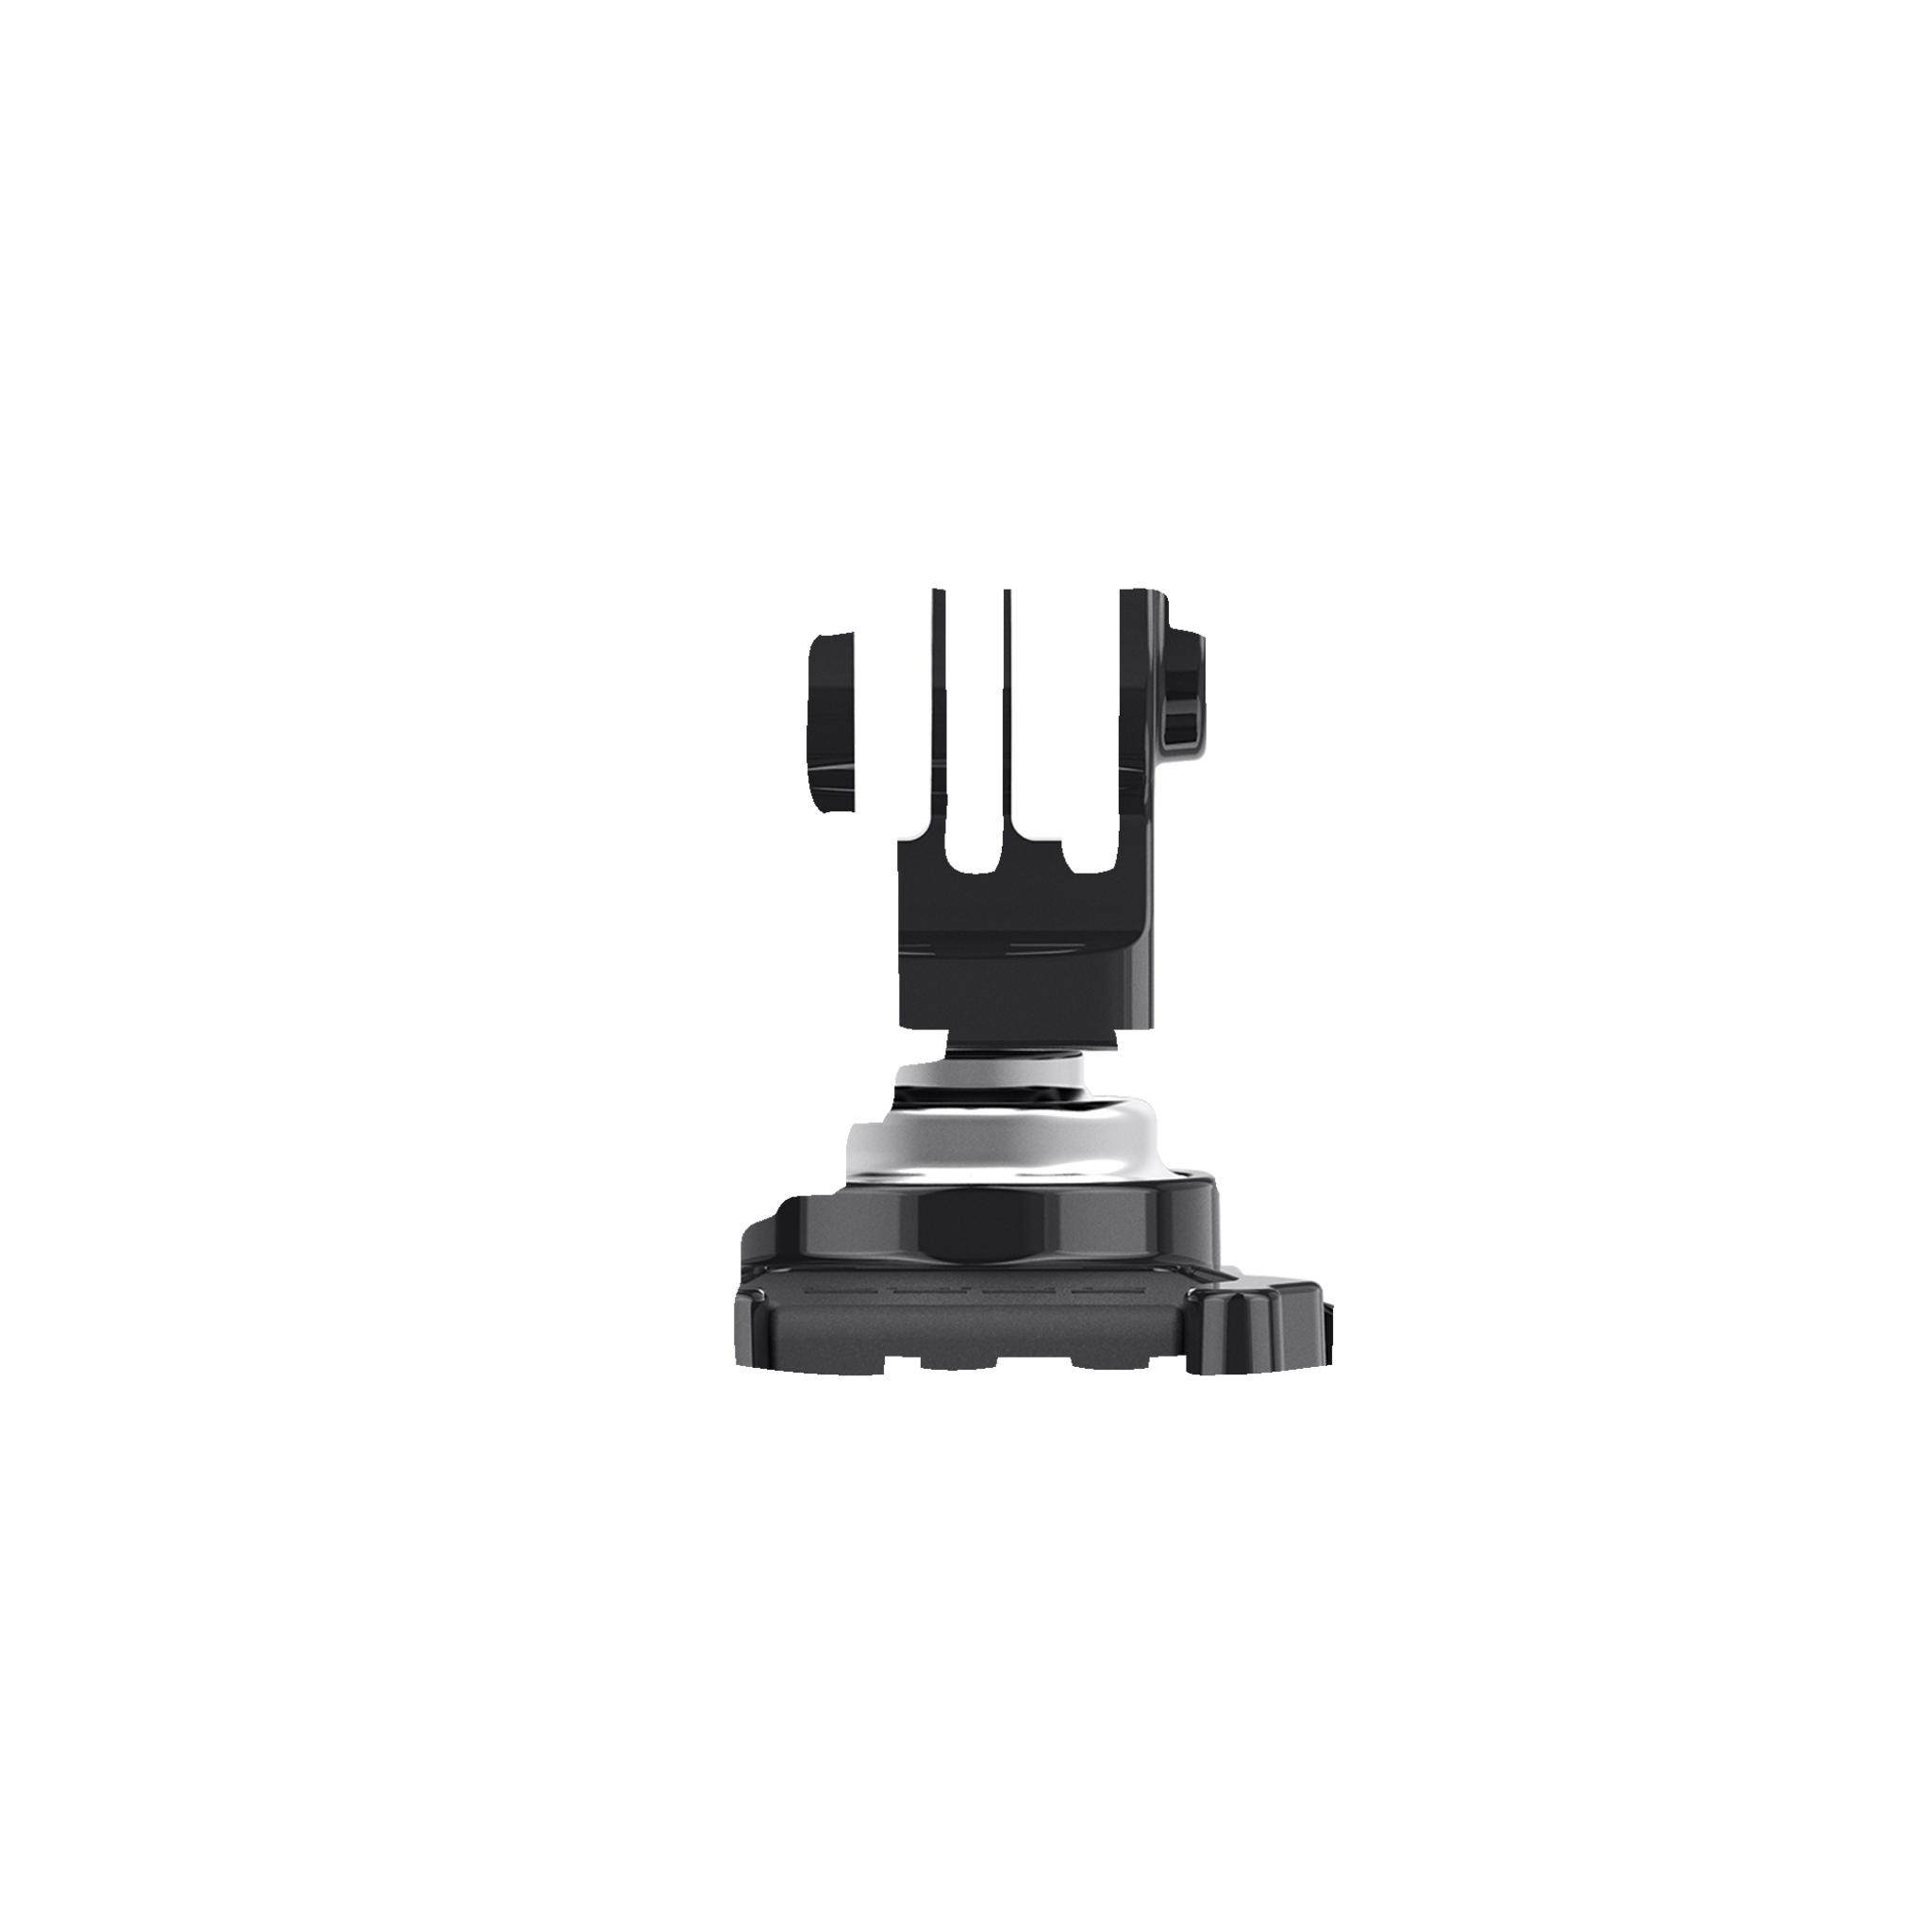 GoPro Cam Acc GoPro Ball Joint Buckle, universalledd